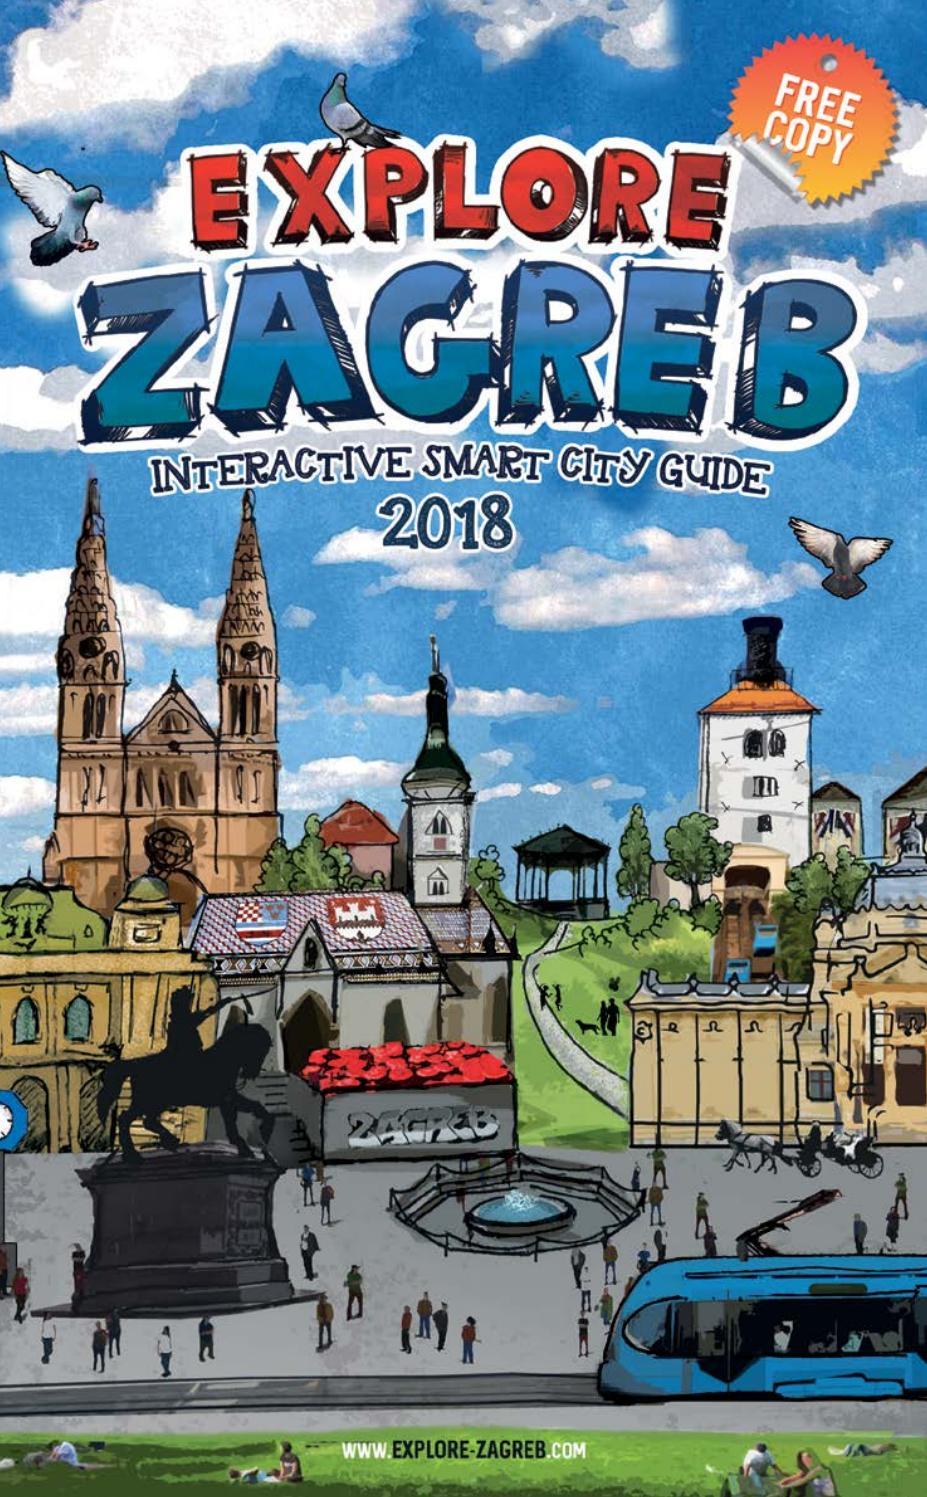 Explore Zagreb 2018 By Ivica Matas Issuu